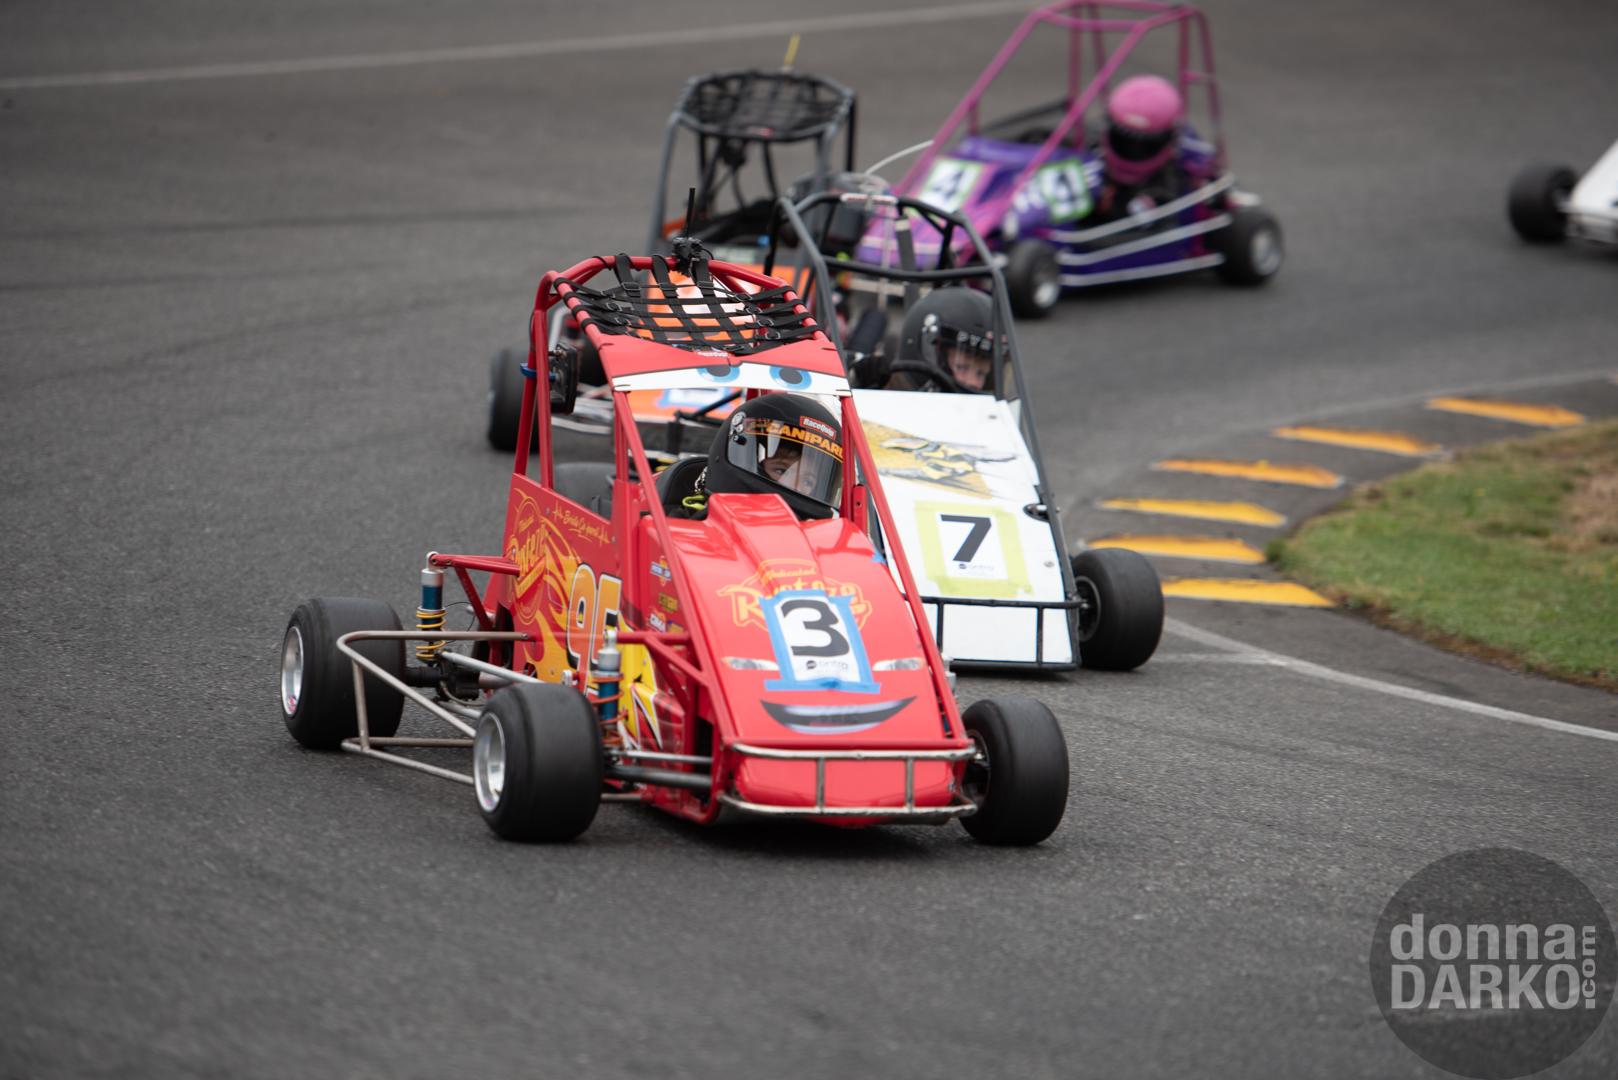 QWMA (Racing) 8-11-2019 DSC_8008.jpg